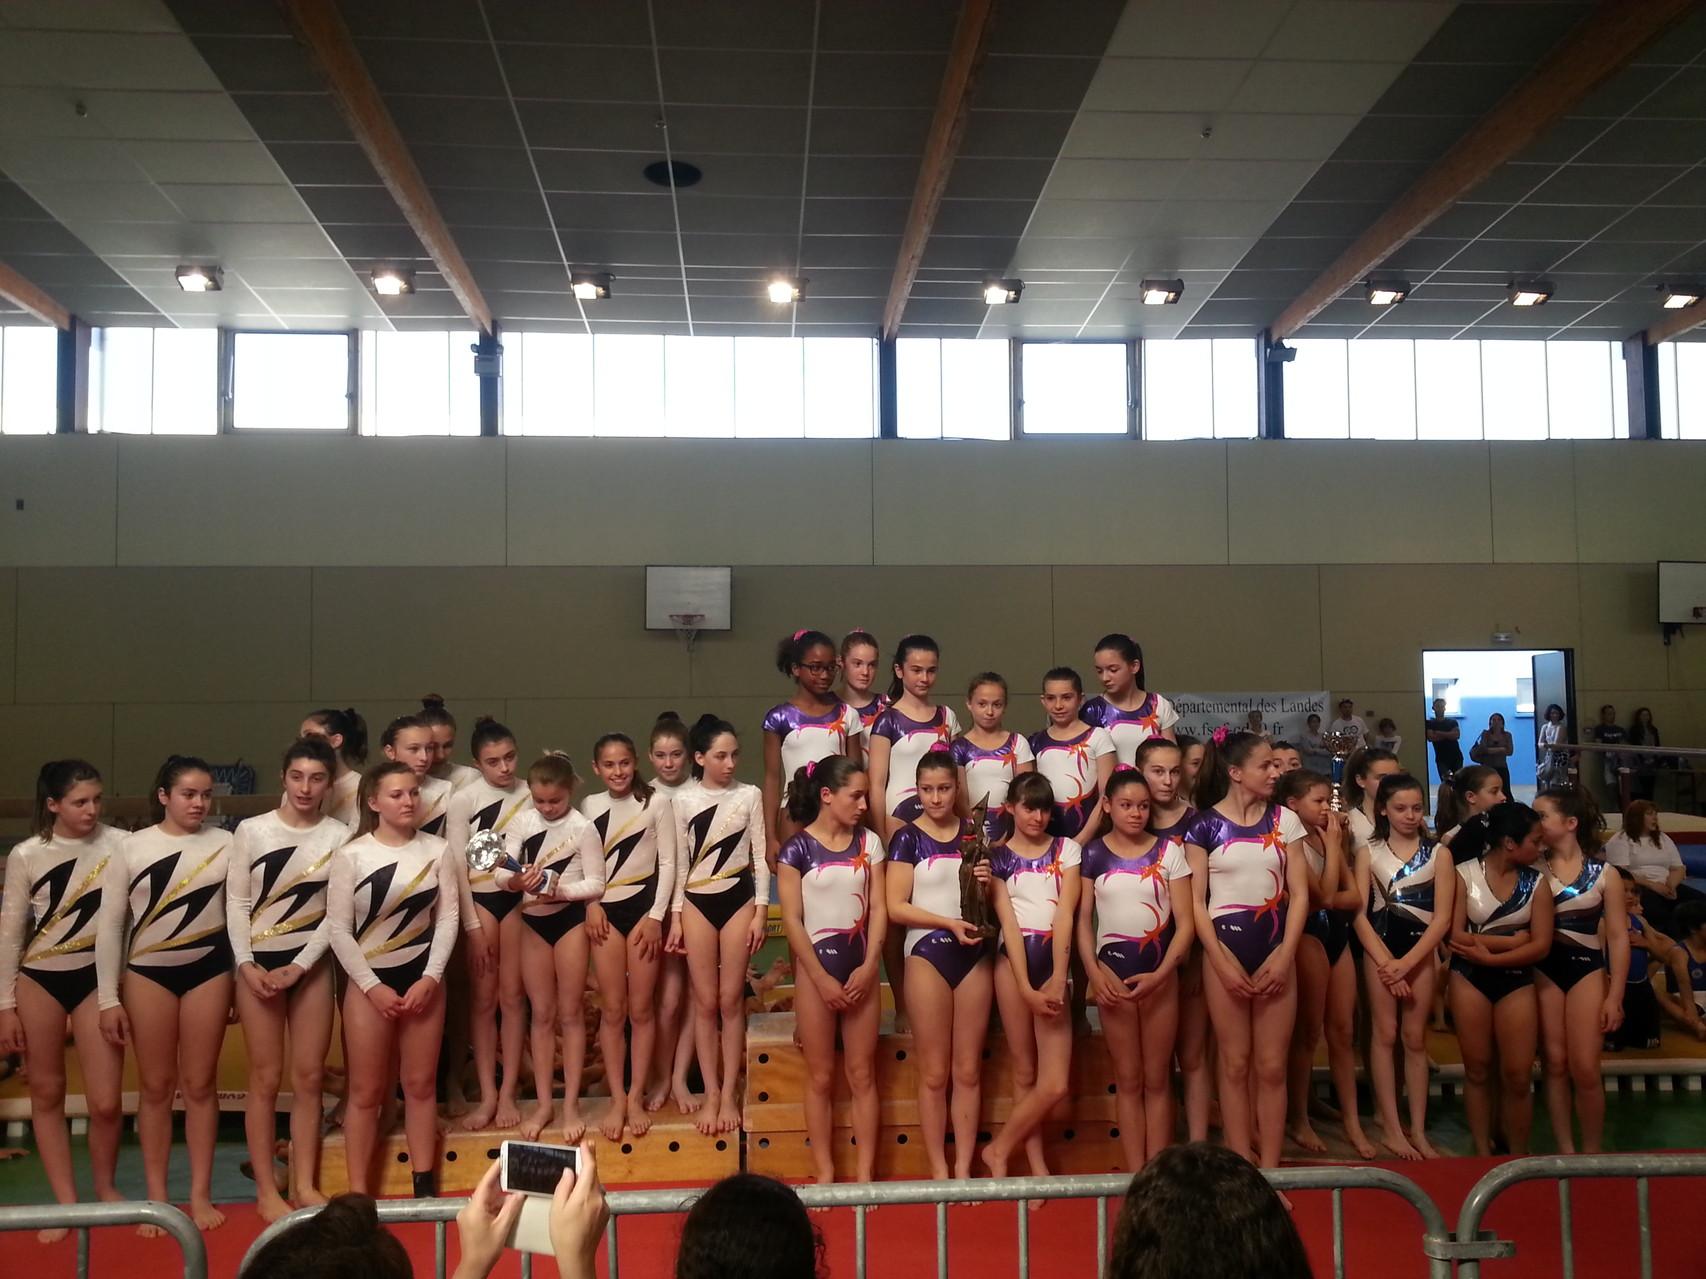 Podium Equipe Jeunesses: 1ère Violette Aturine,, 2ème Espoir Mugronnais, 3ème Jeanne d'Arc de Dax